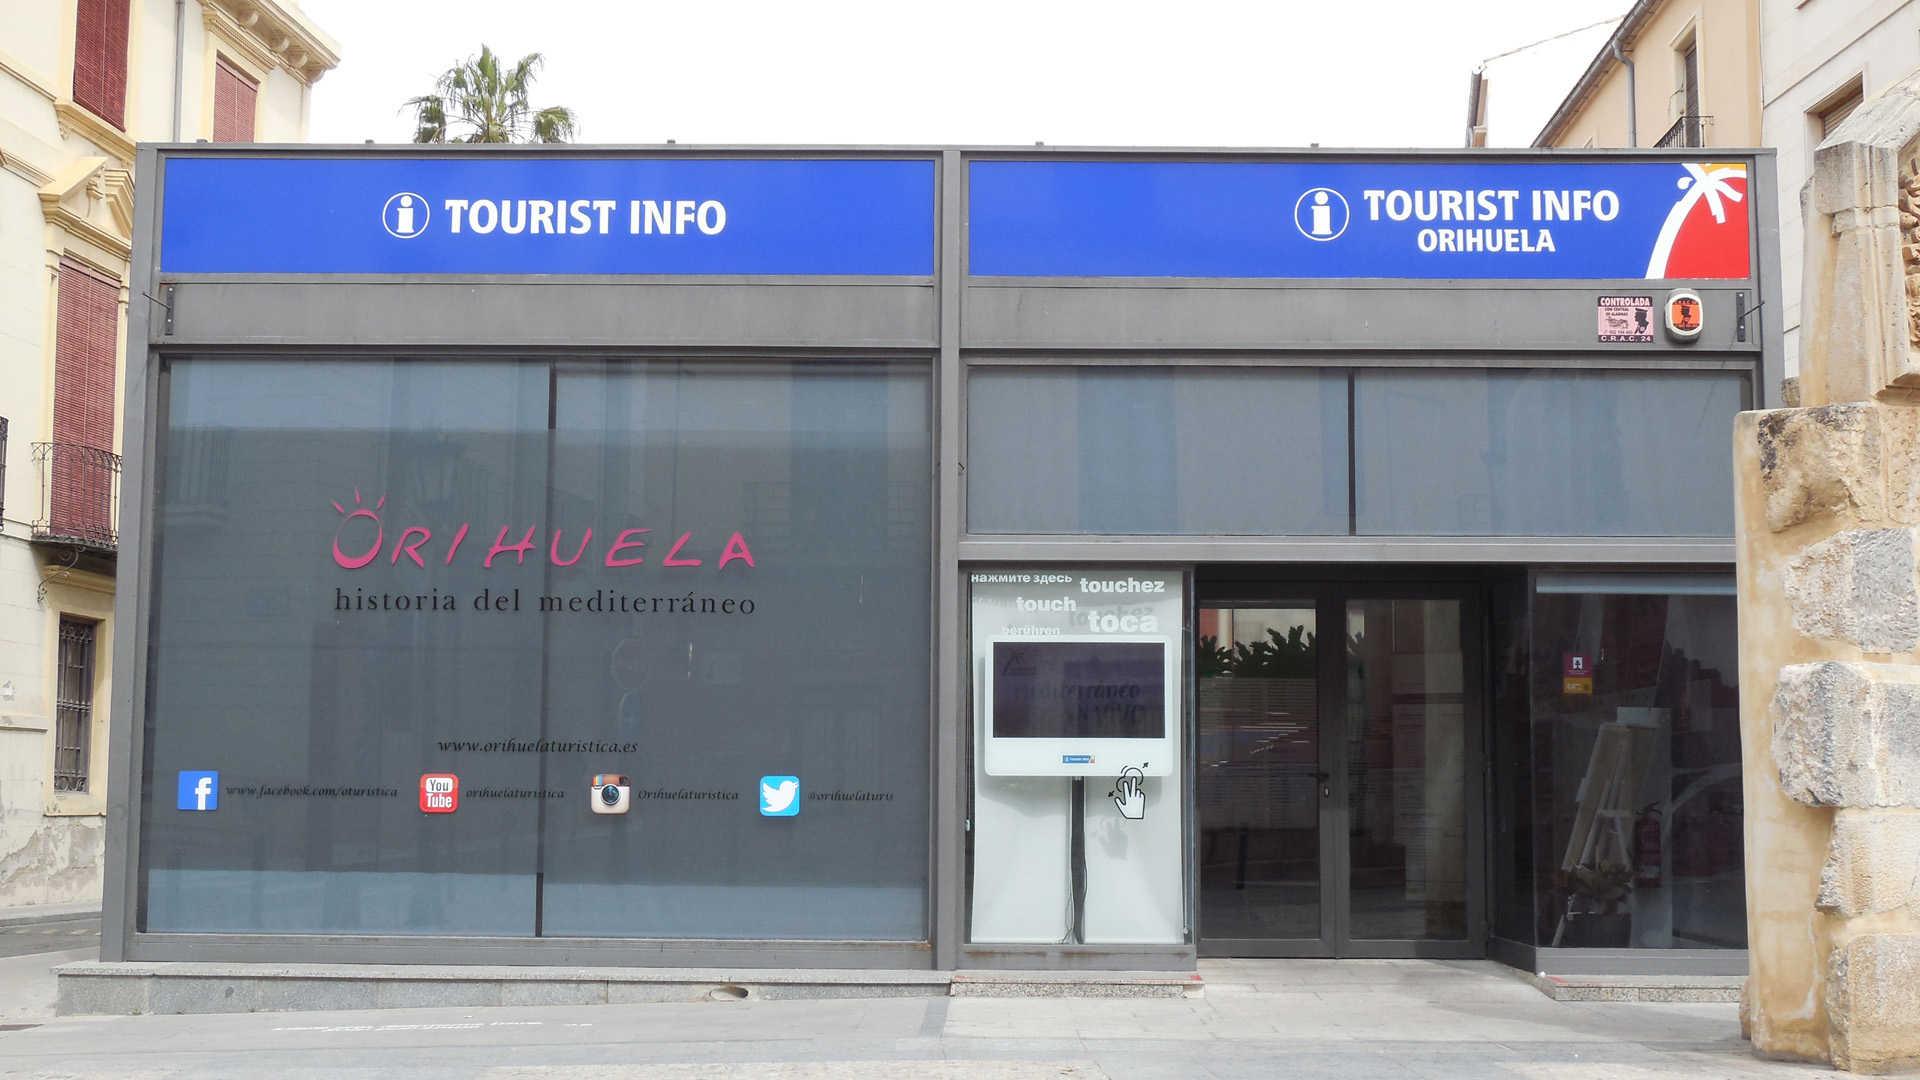 TOURIST INFO ORIHUELA - CENTRO